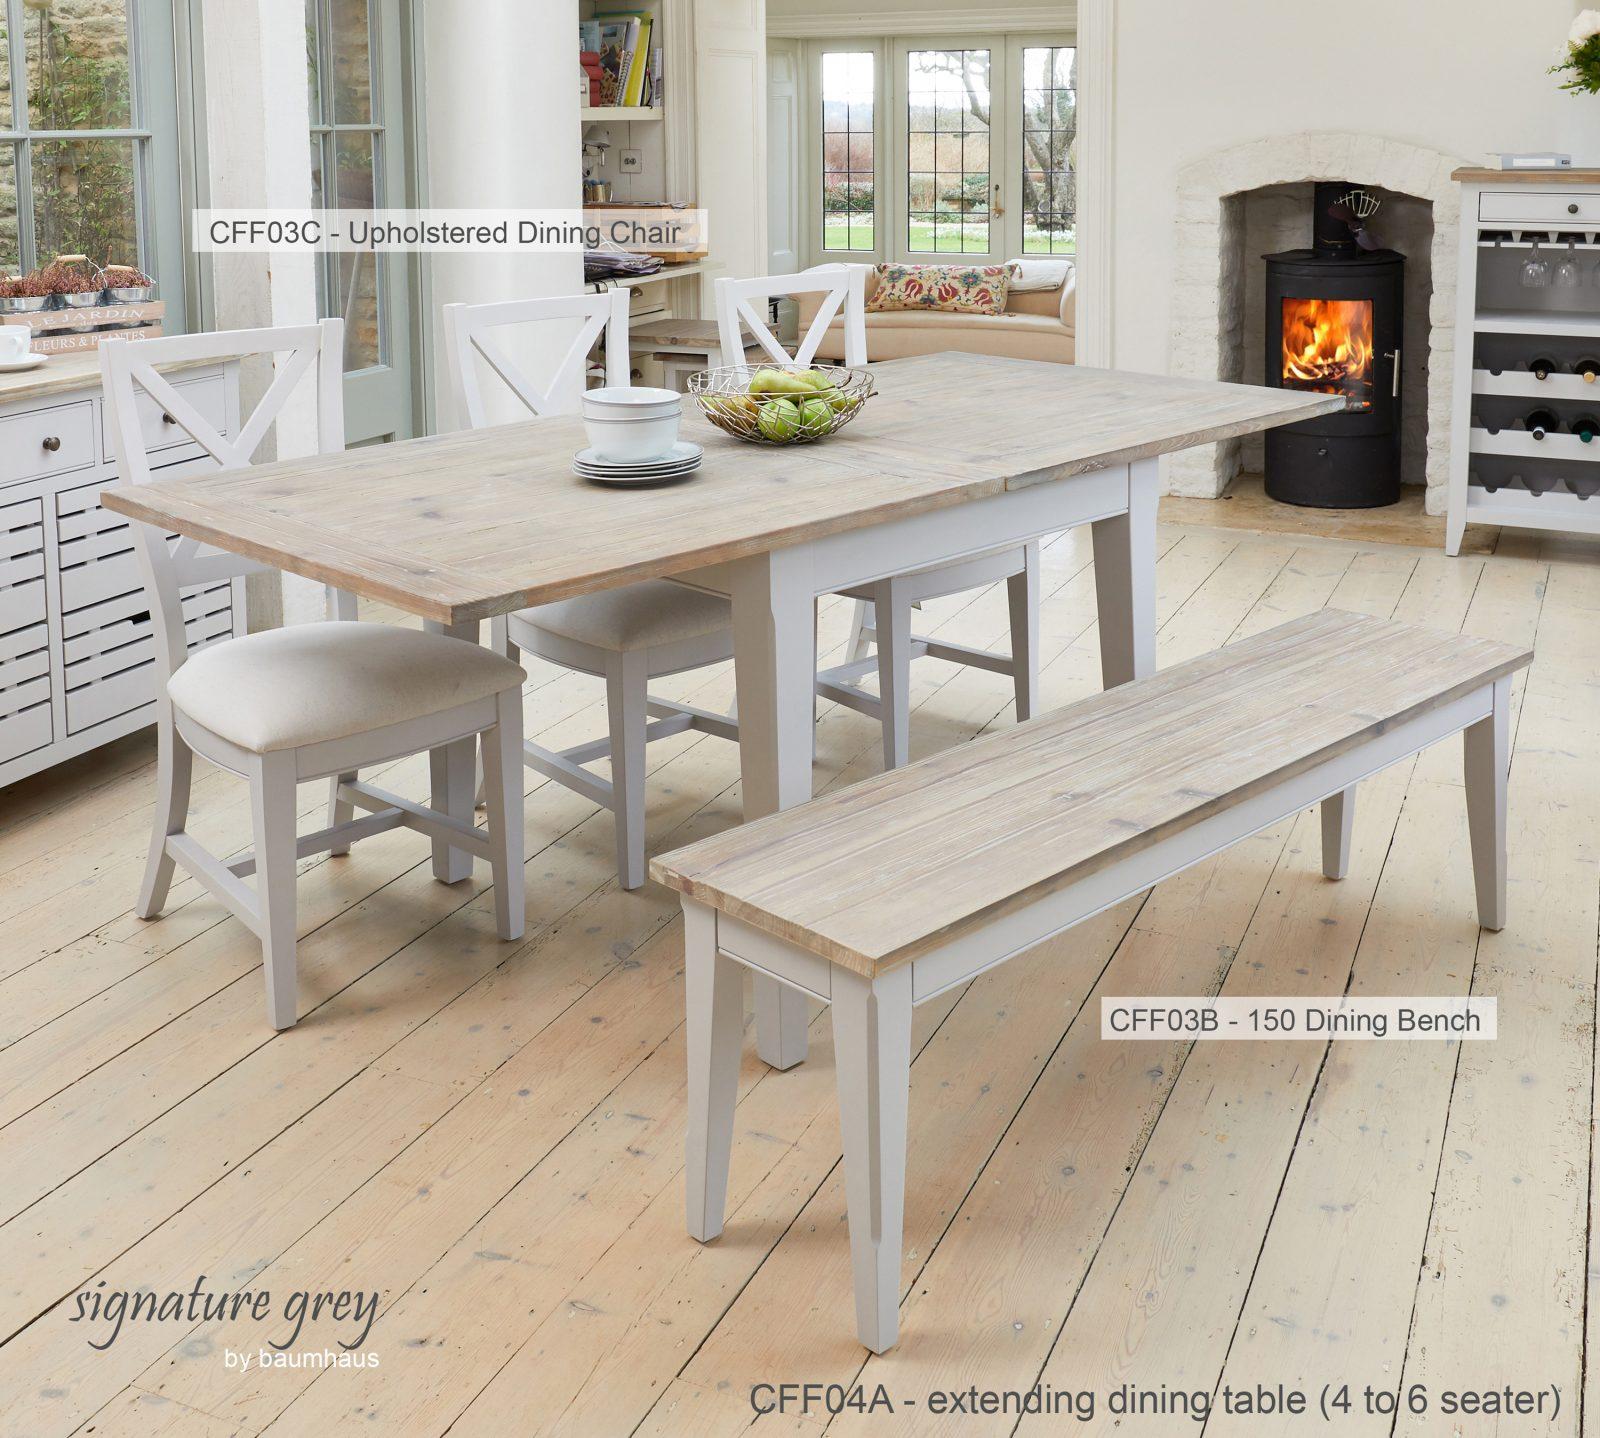 Baumhaus Signature Grey Extending Dining Table Bargain Oak